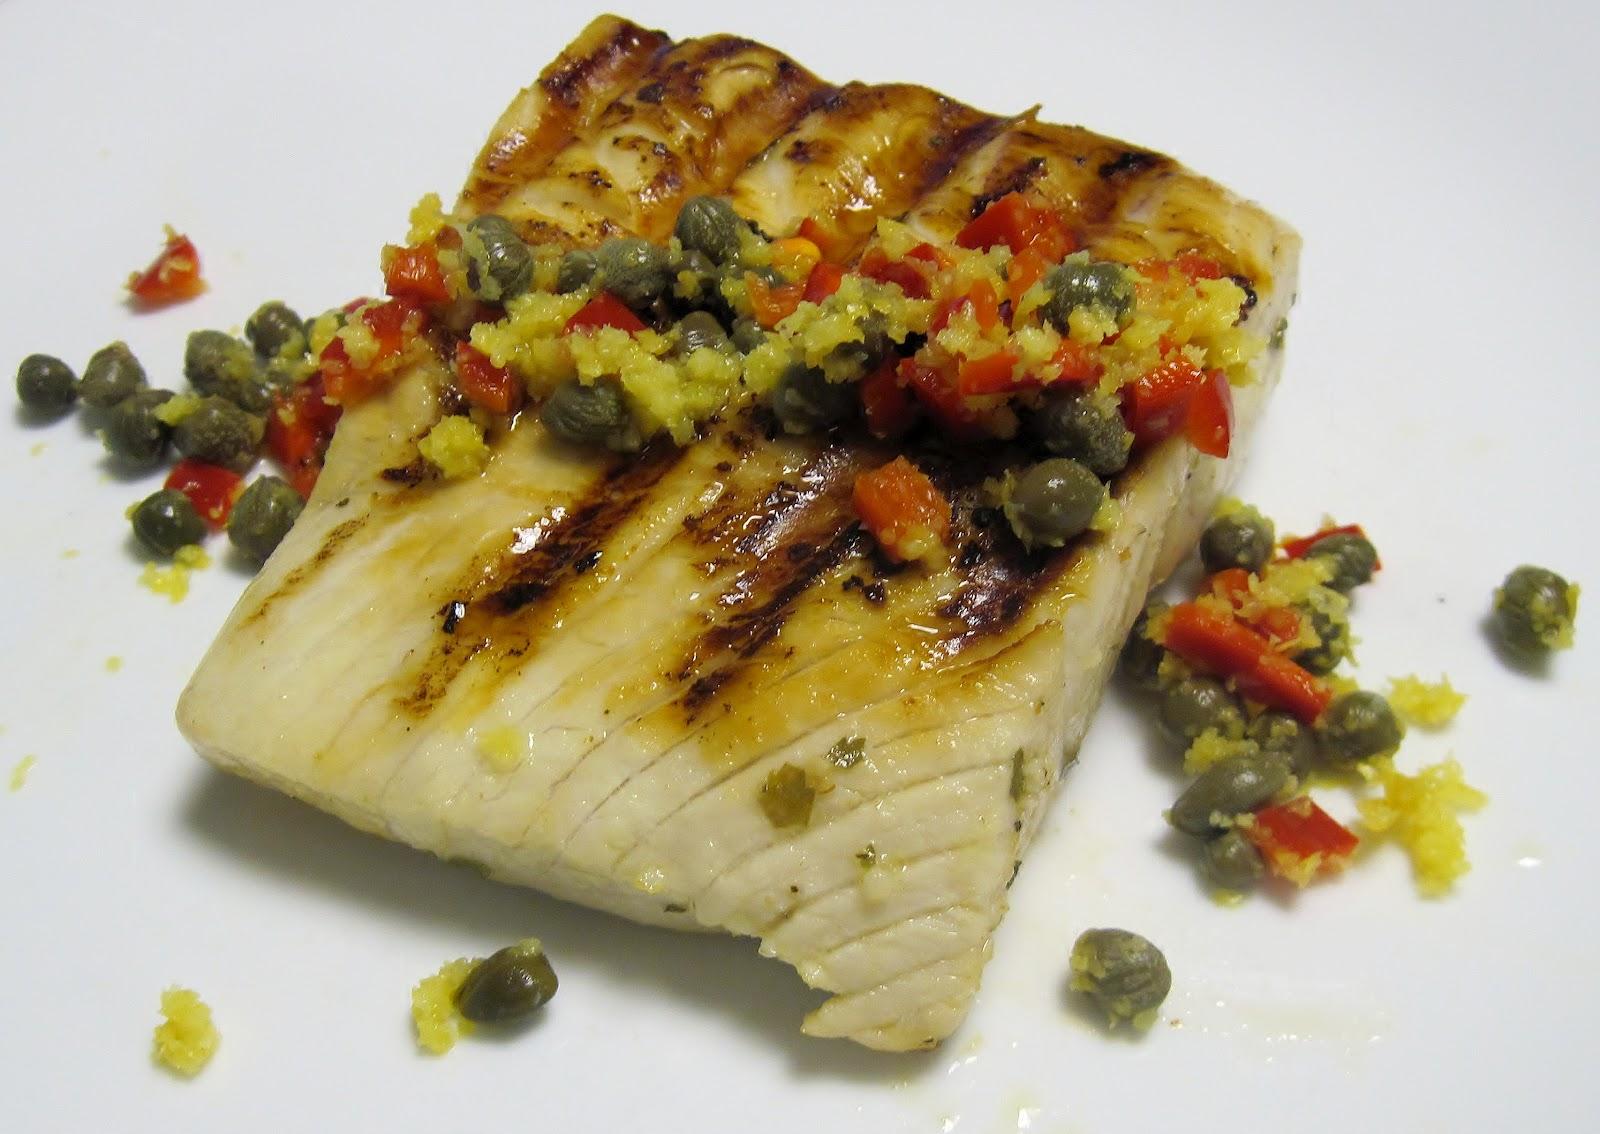 Carolina sauce company gloria 39 s cuban style grilled fish for Cuban fish recipes